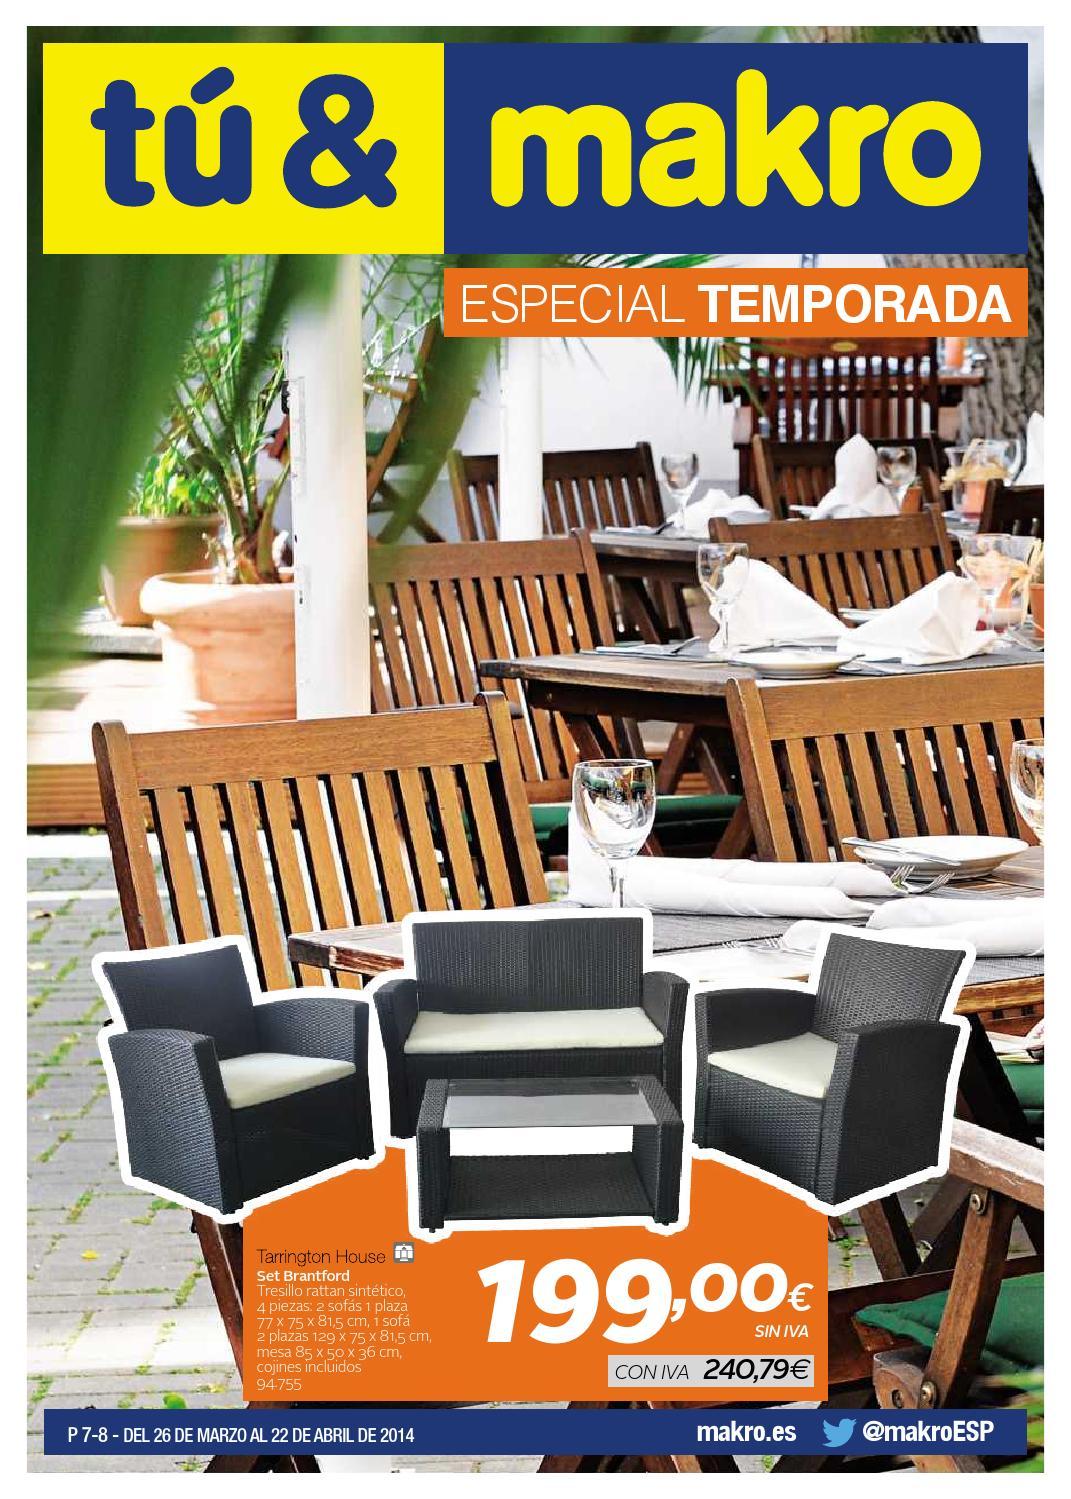 Makro espana ofertas especial temporada peninsula by for Oferta mueble jardin